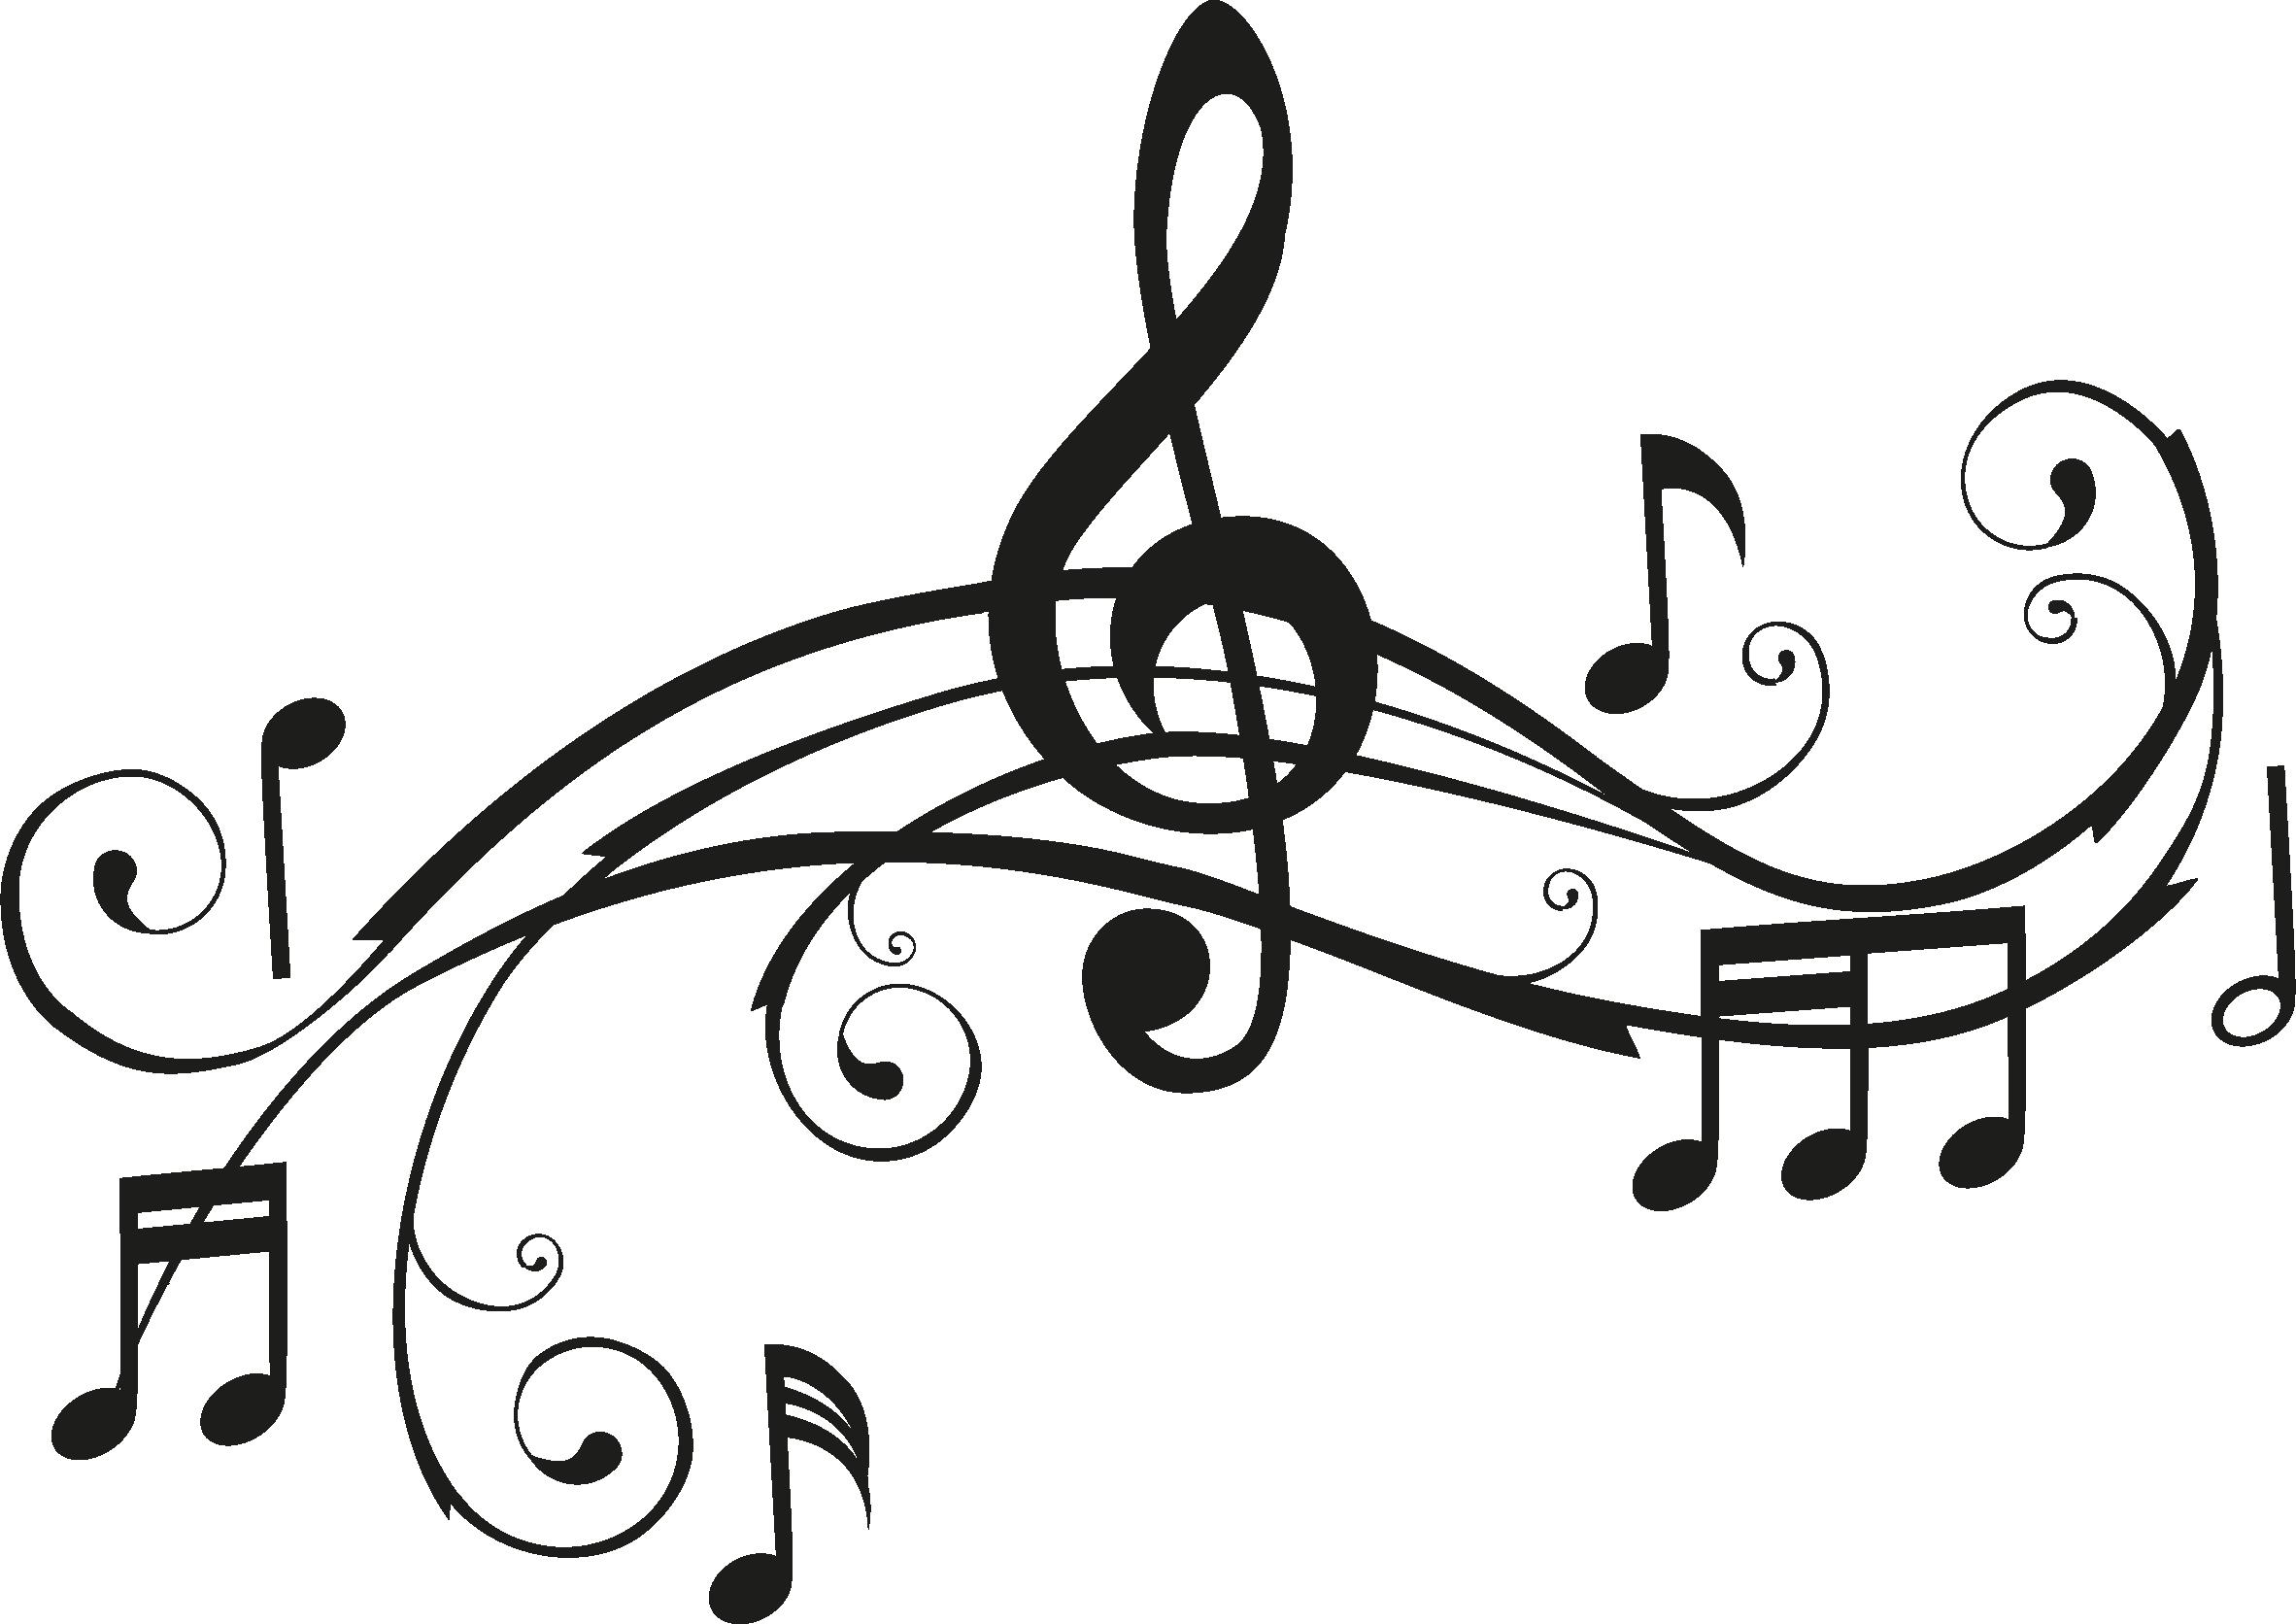 Music note transparent 38g 2364x1672 printwallart musical notes 2364x1672 printwallart musical notes 256x256 sheet music clipart transparent background voltagebd Images